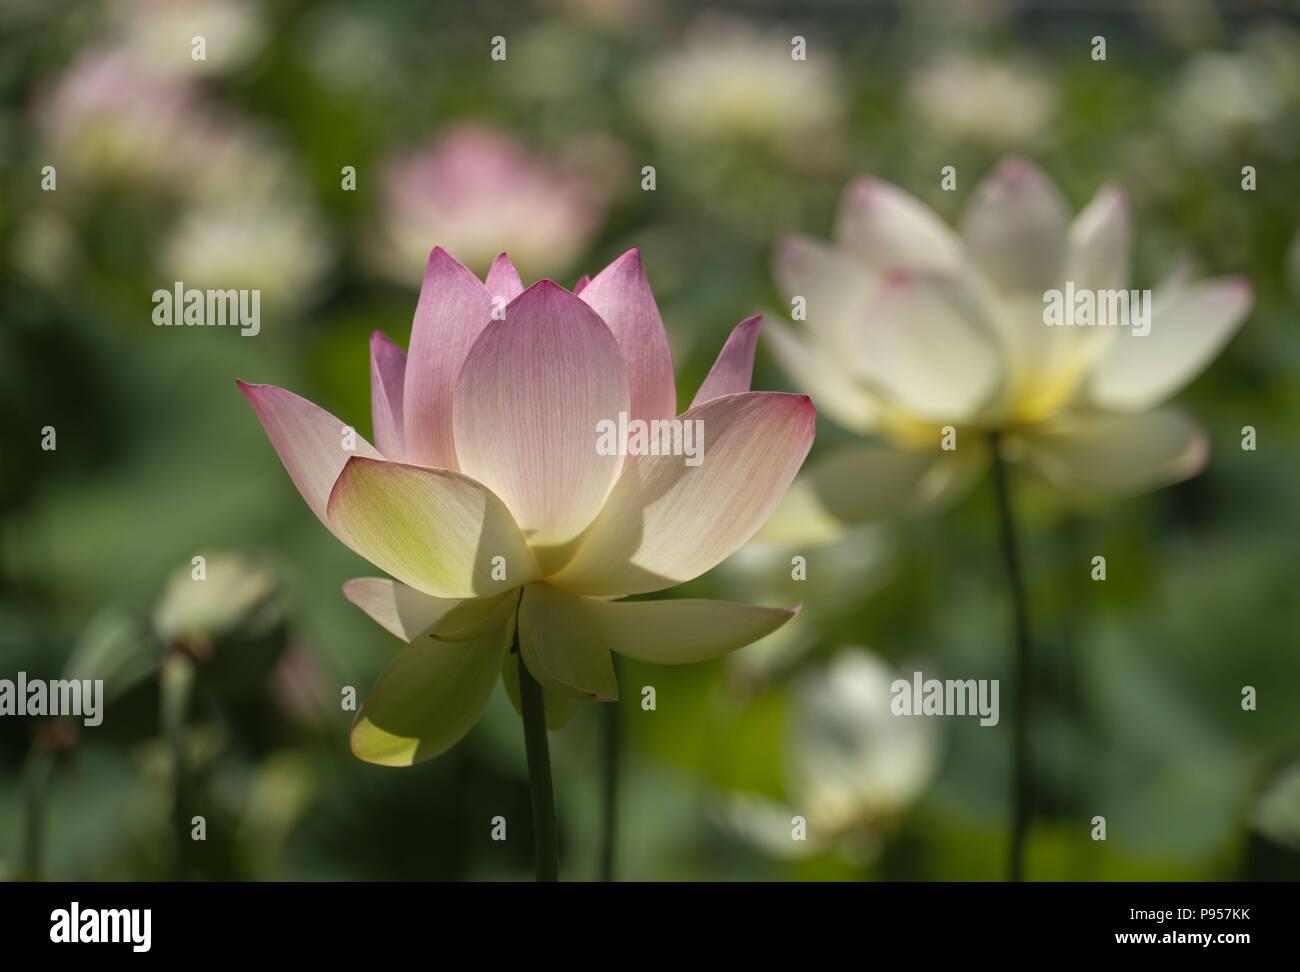 Los Angeles California Usa 14th July 2018 Lotus Flowers Bloom